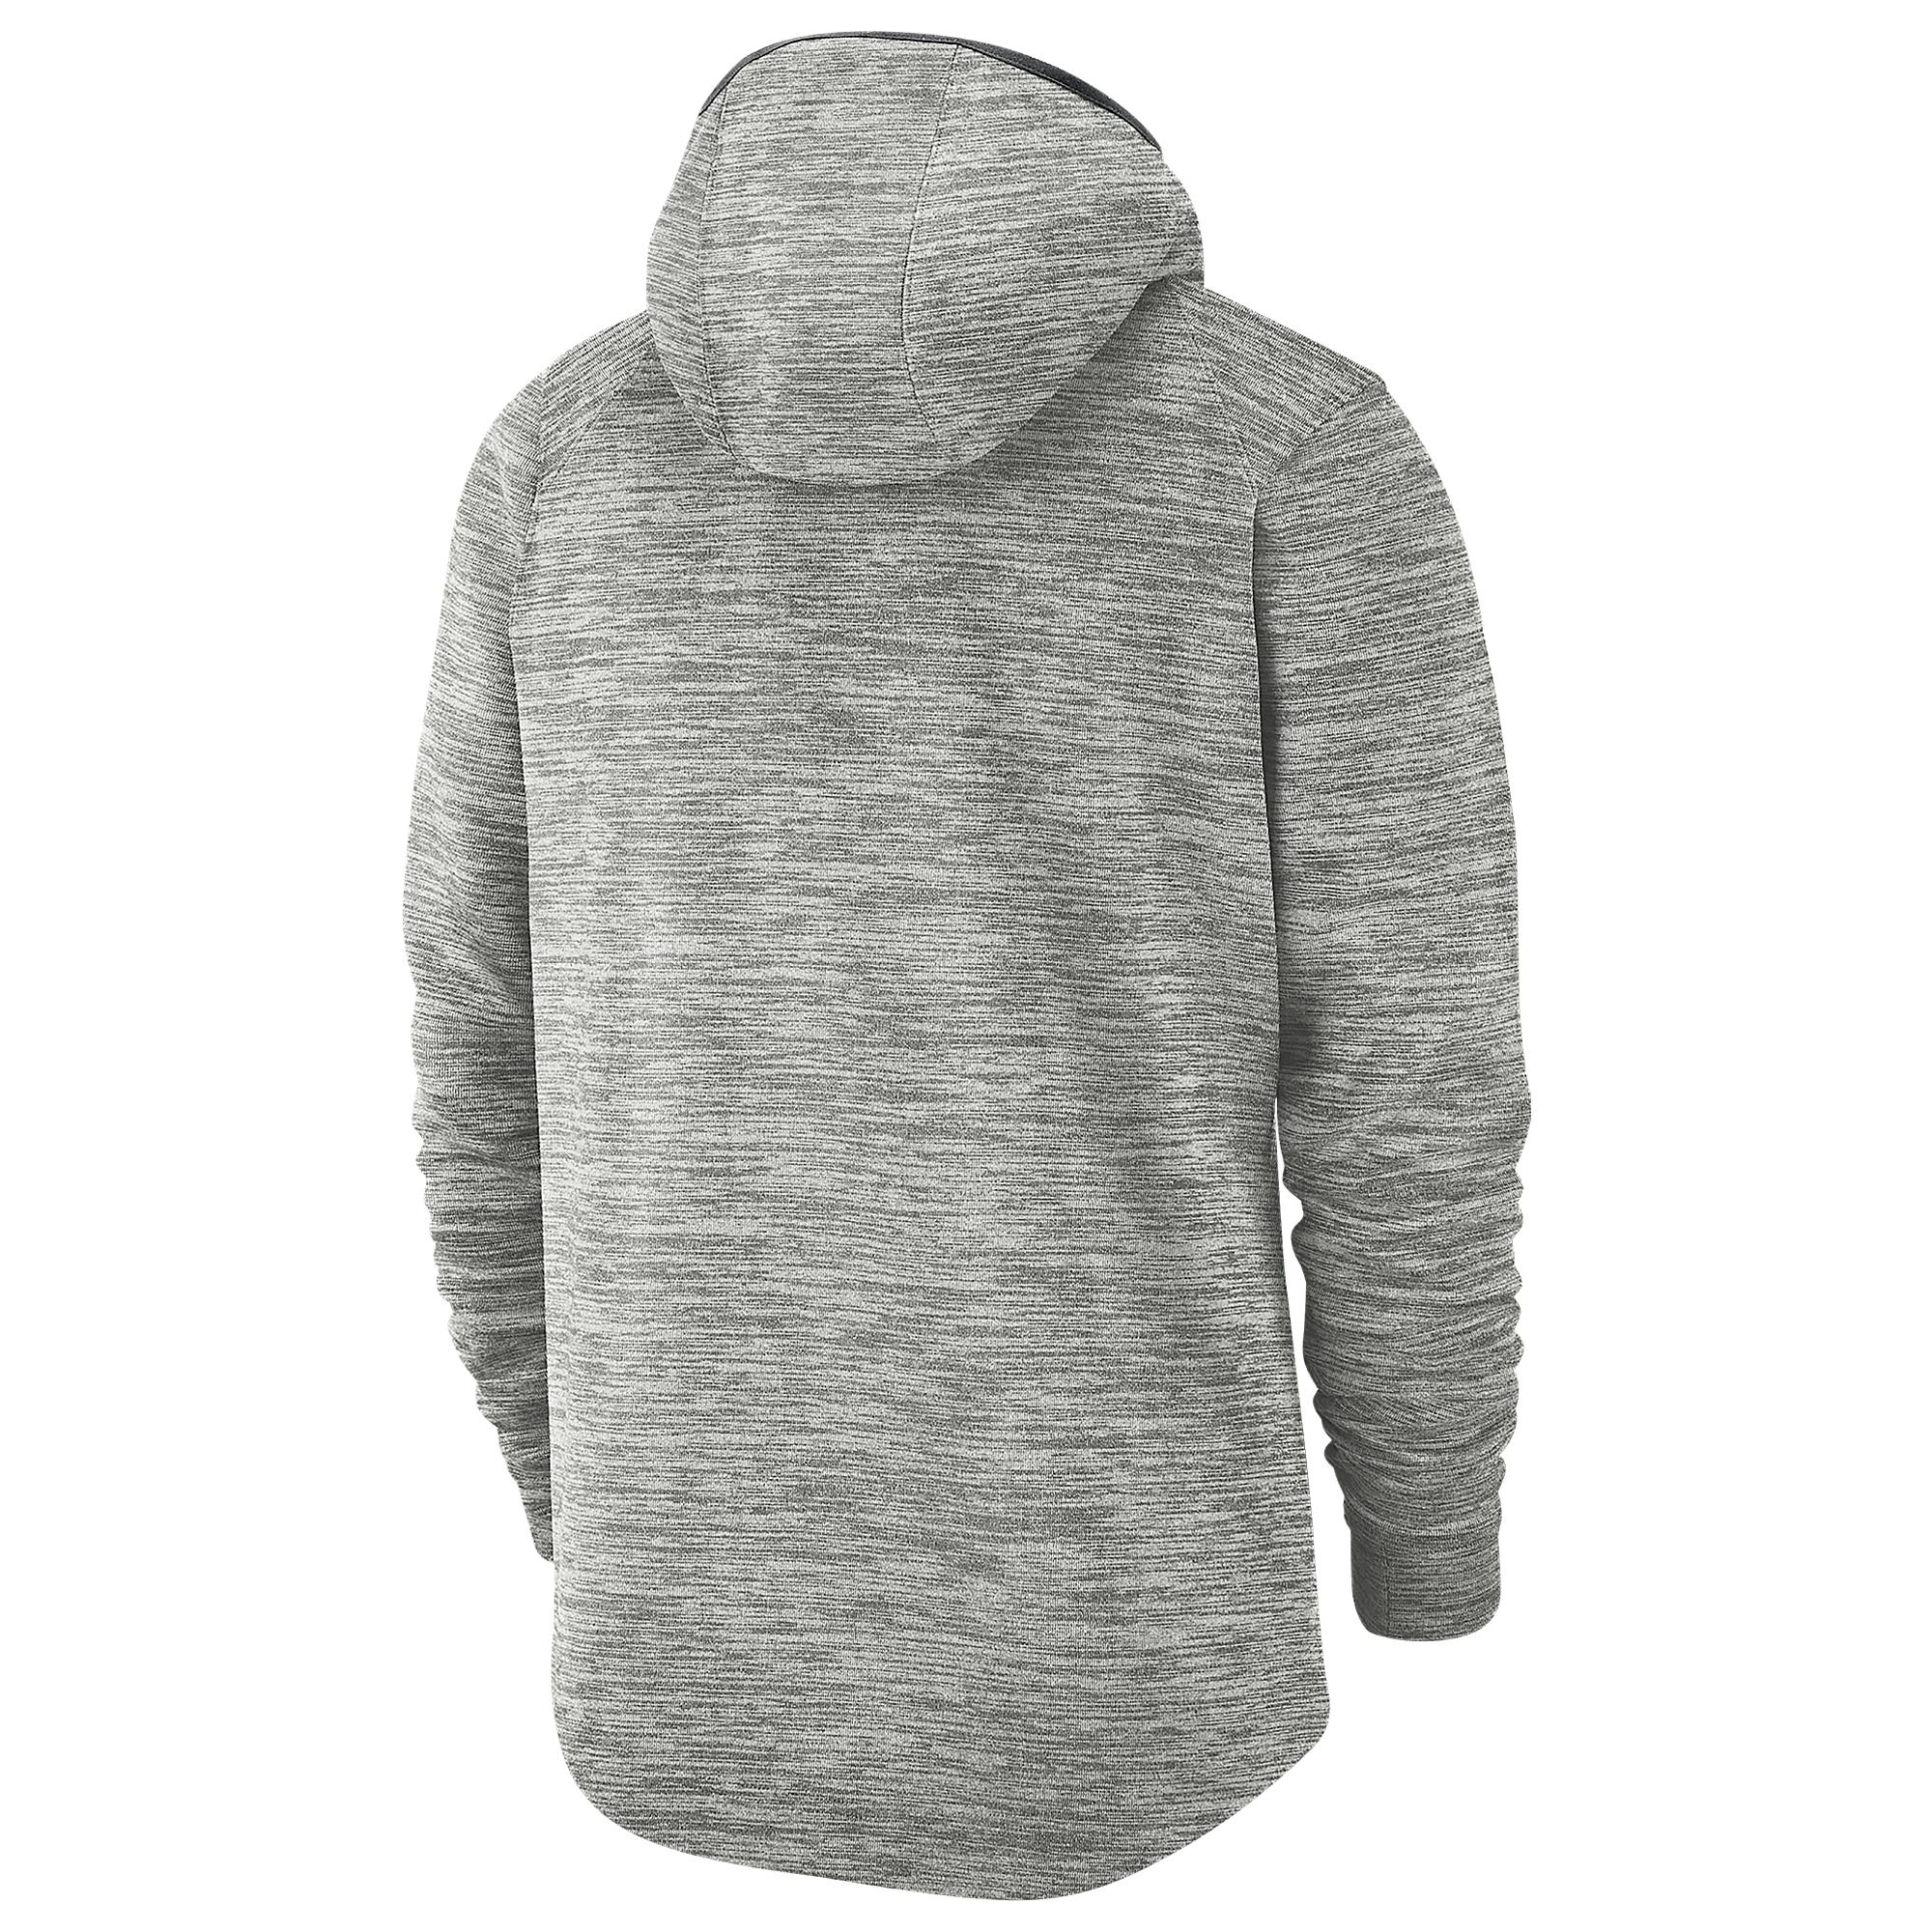 Nike Synthetic Nba Spotlight Pullover